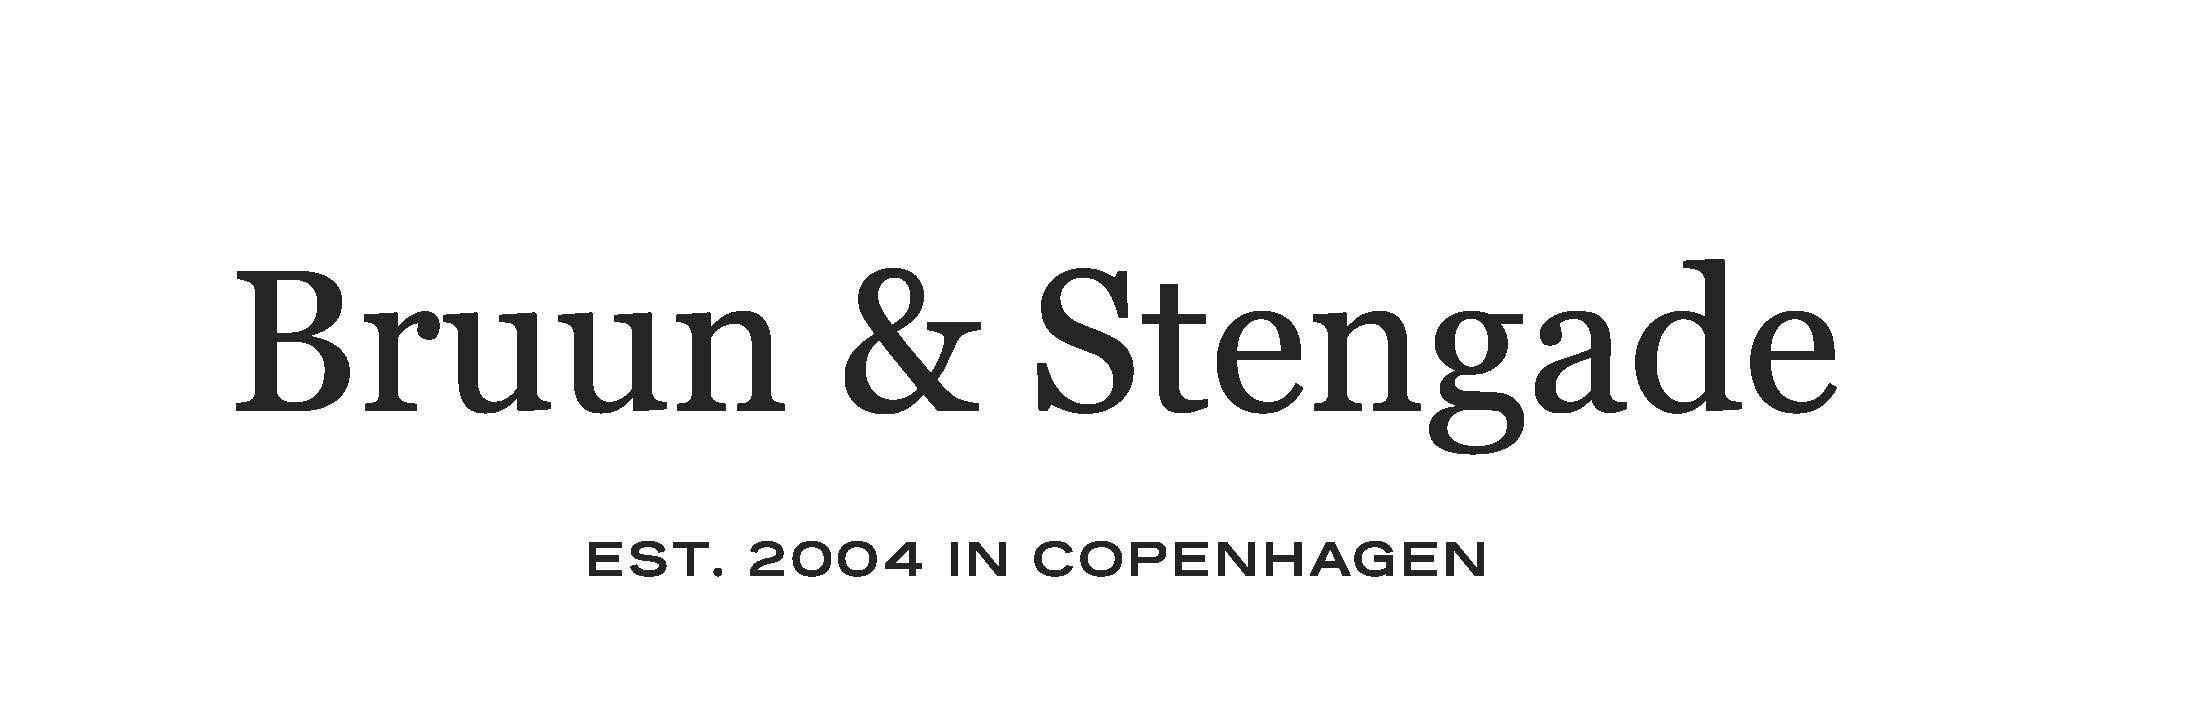 BnS_EST 2004_FW2014_ENG